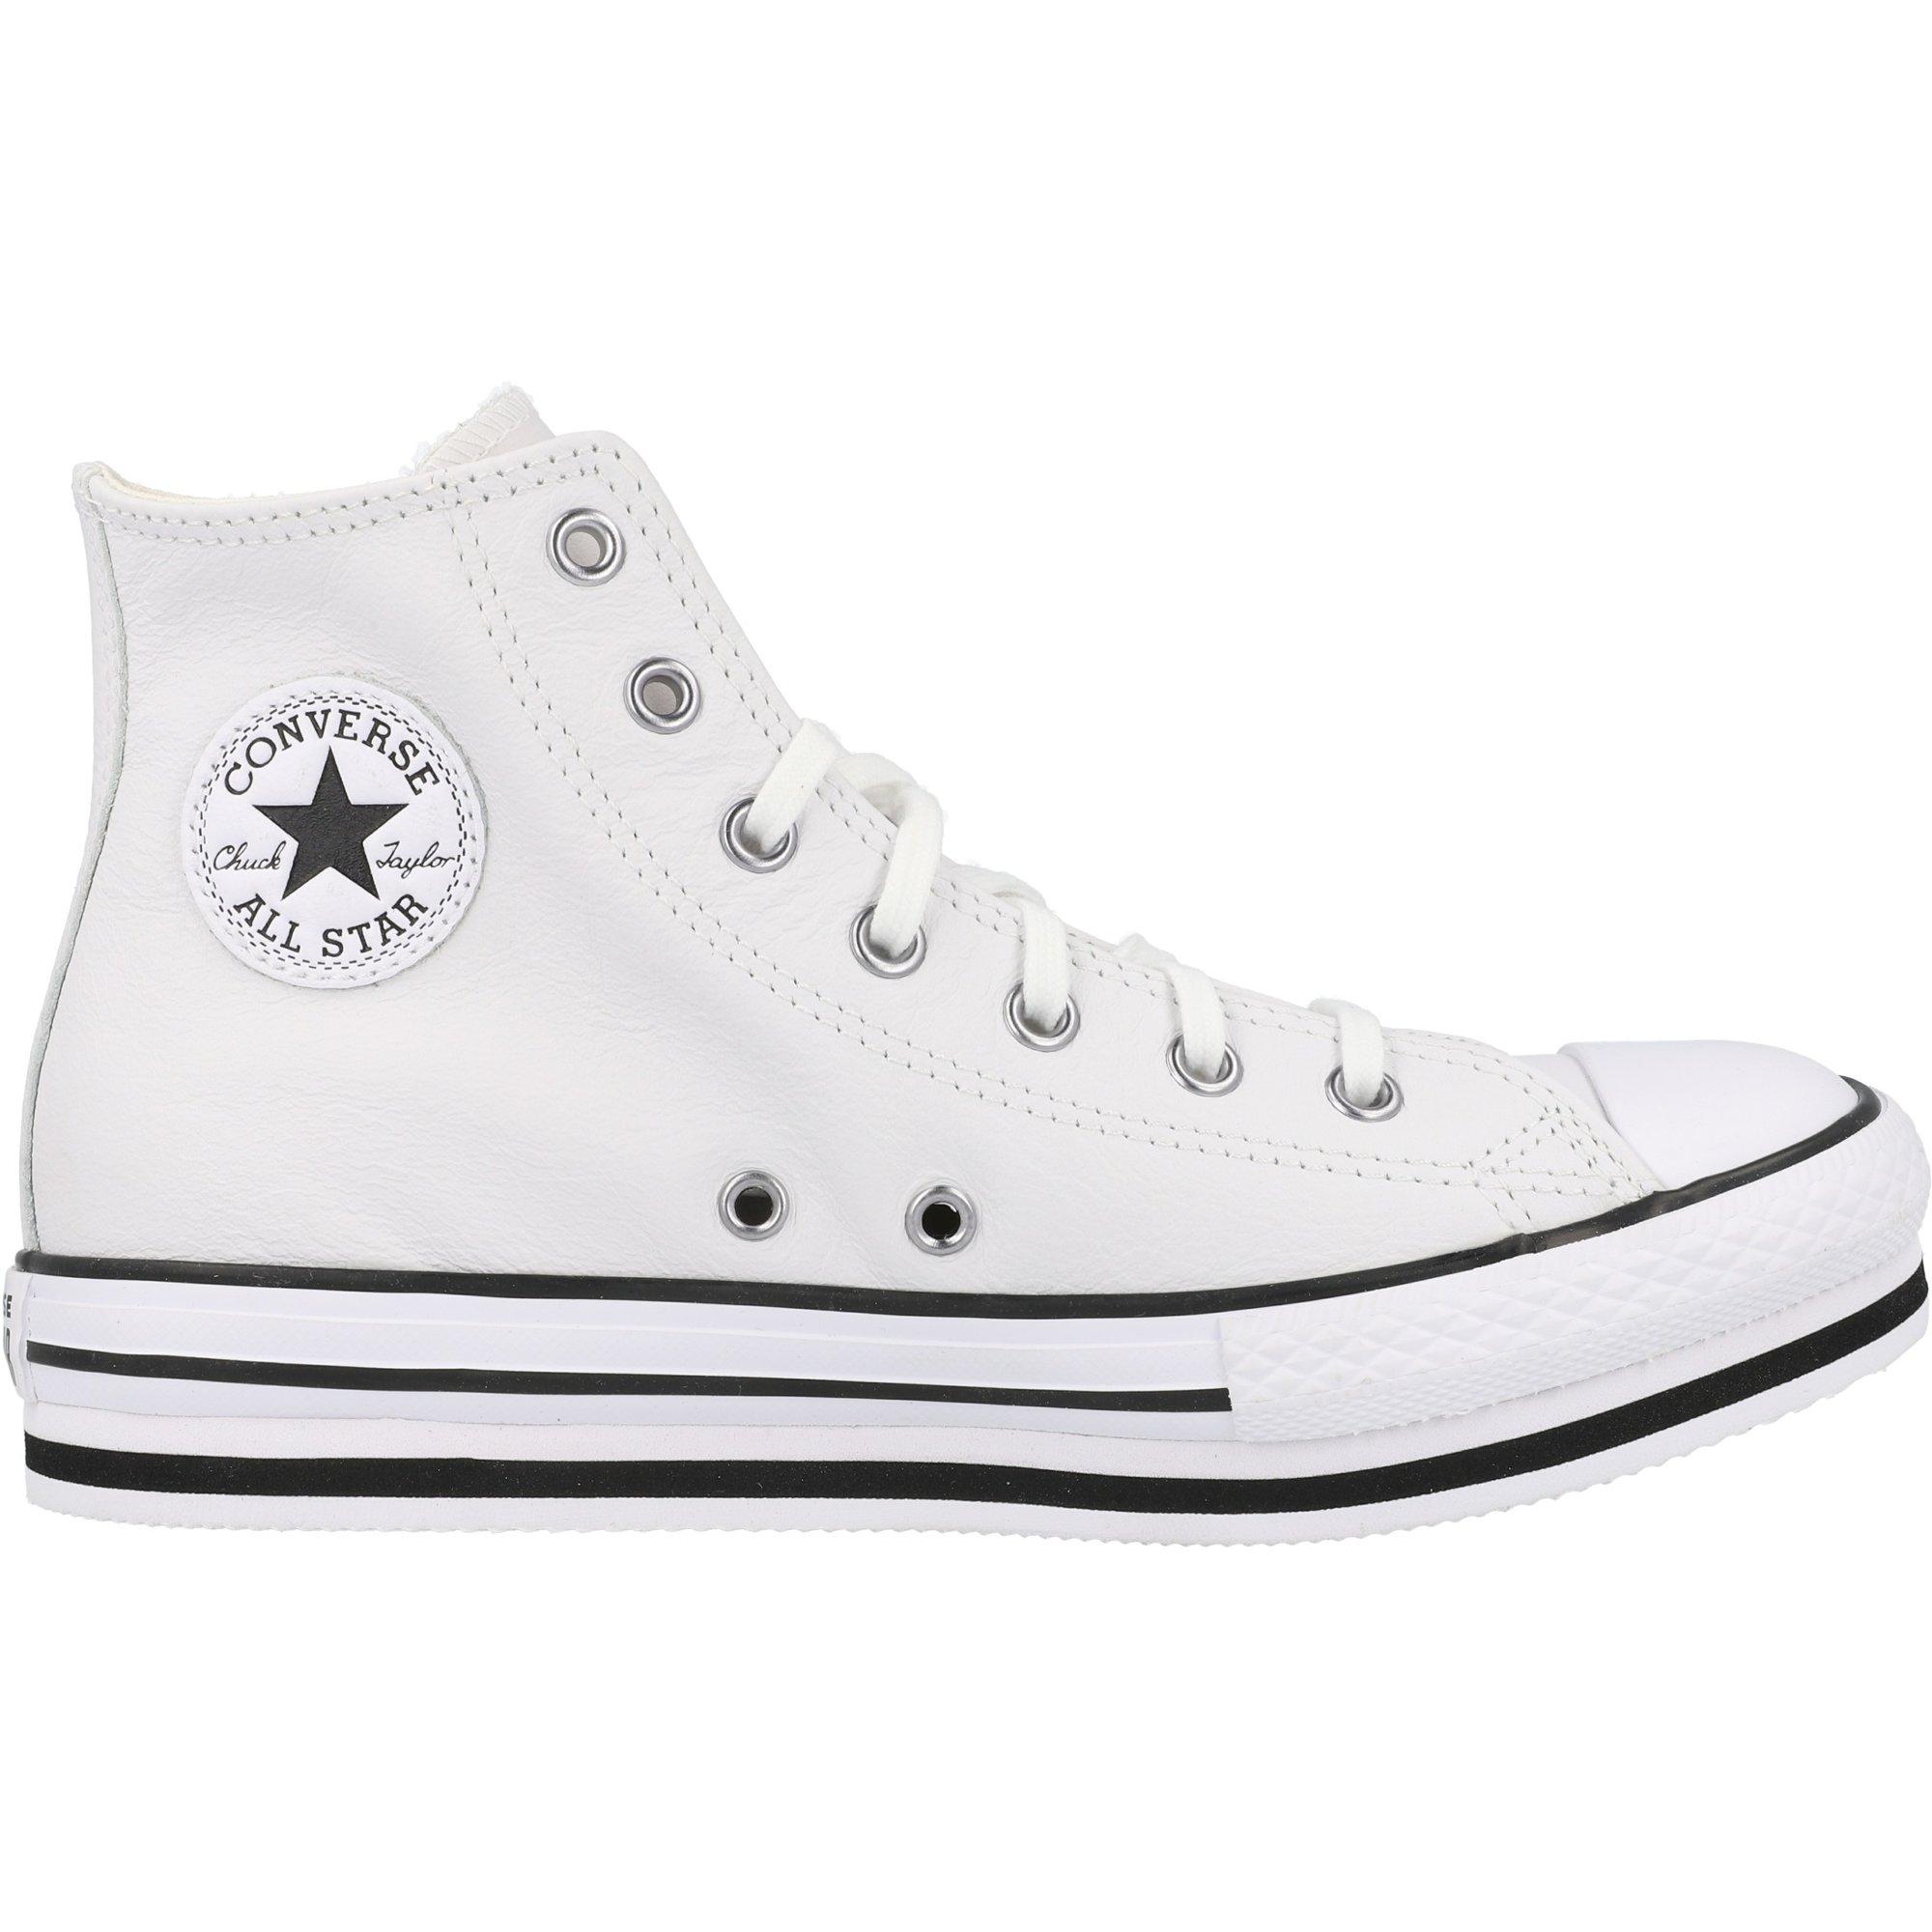 Converse Chuck Taylor All Star Platform EVA Hi White/Black Leather